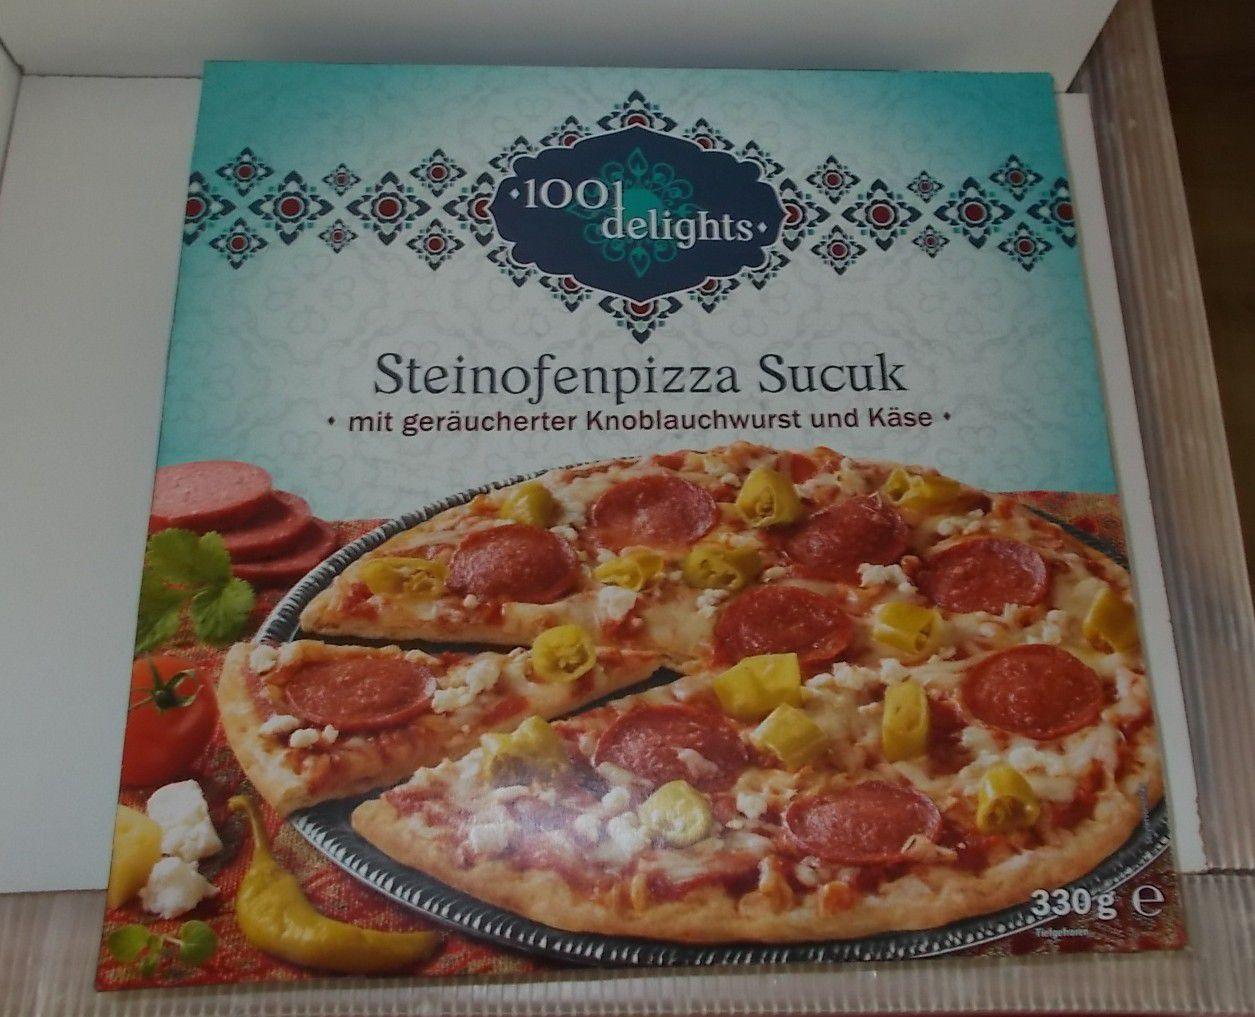 Lidl 1001 Delights Steinofenpizza Sucuk